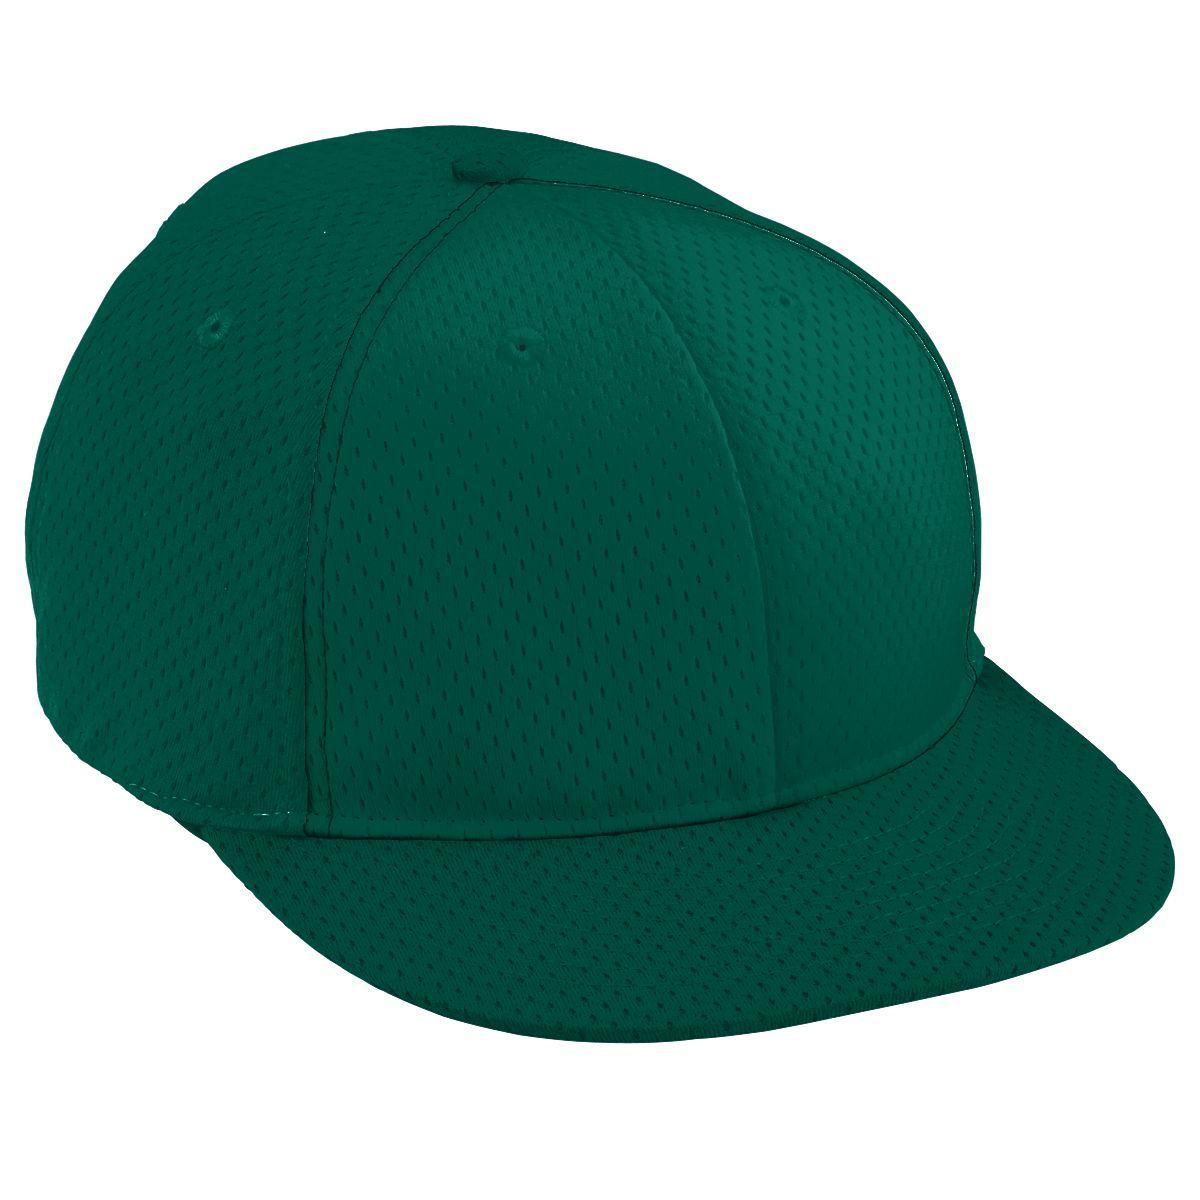 Youth Athletic Mesh Flat Bill Cap - DARK GREEN/DARK GREEN/DARK GREEN